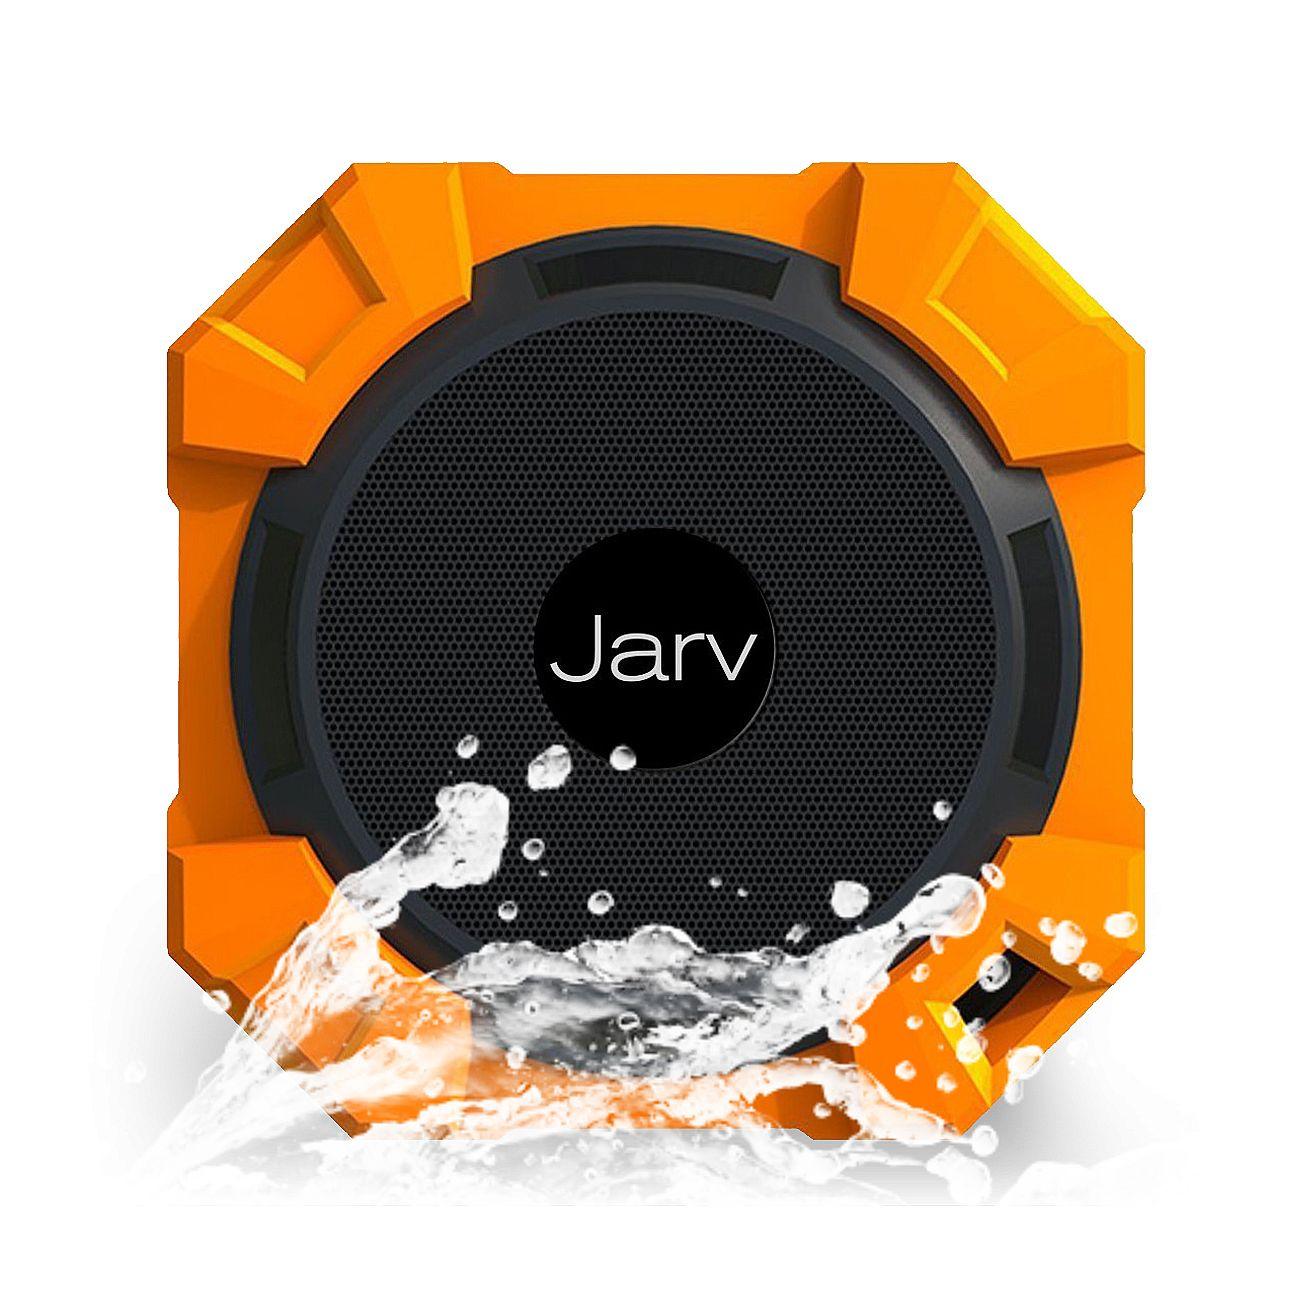 Jarv X96 Rugged Indoor/Outdoor 5 Watt Bluetooth Portable Speaker